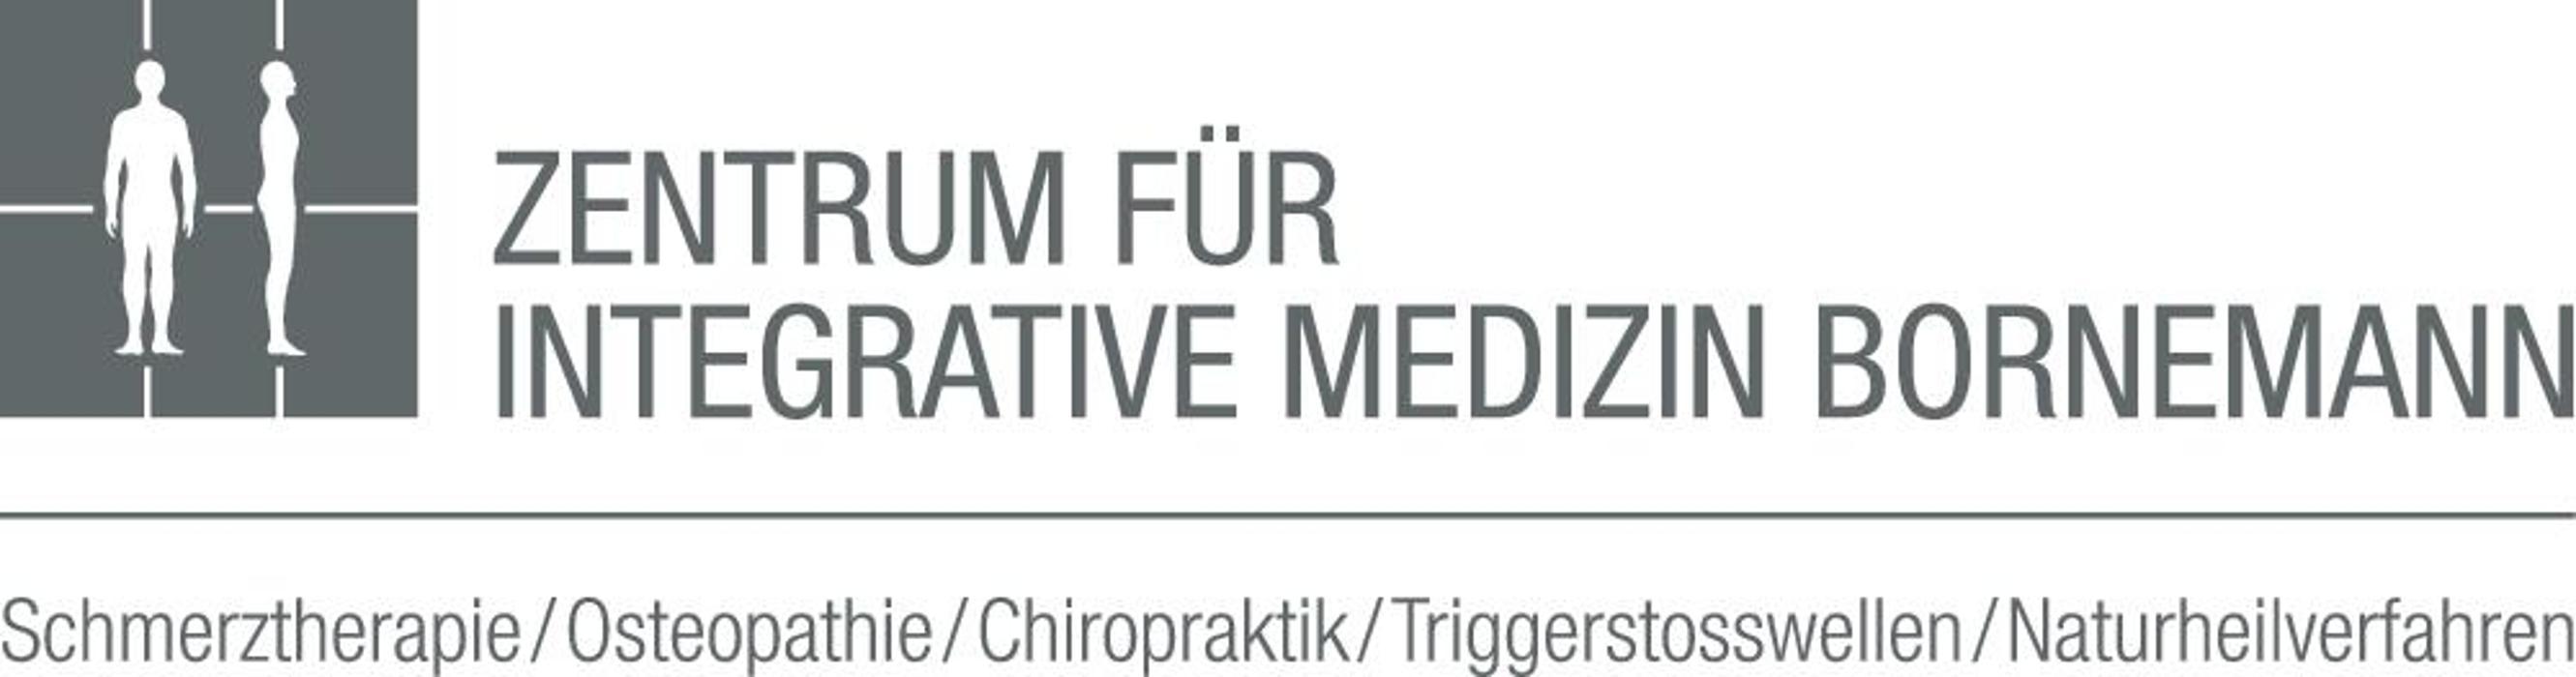 Bild zu Zentrum für integrative Medizin Bornemann in Lübeck